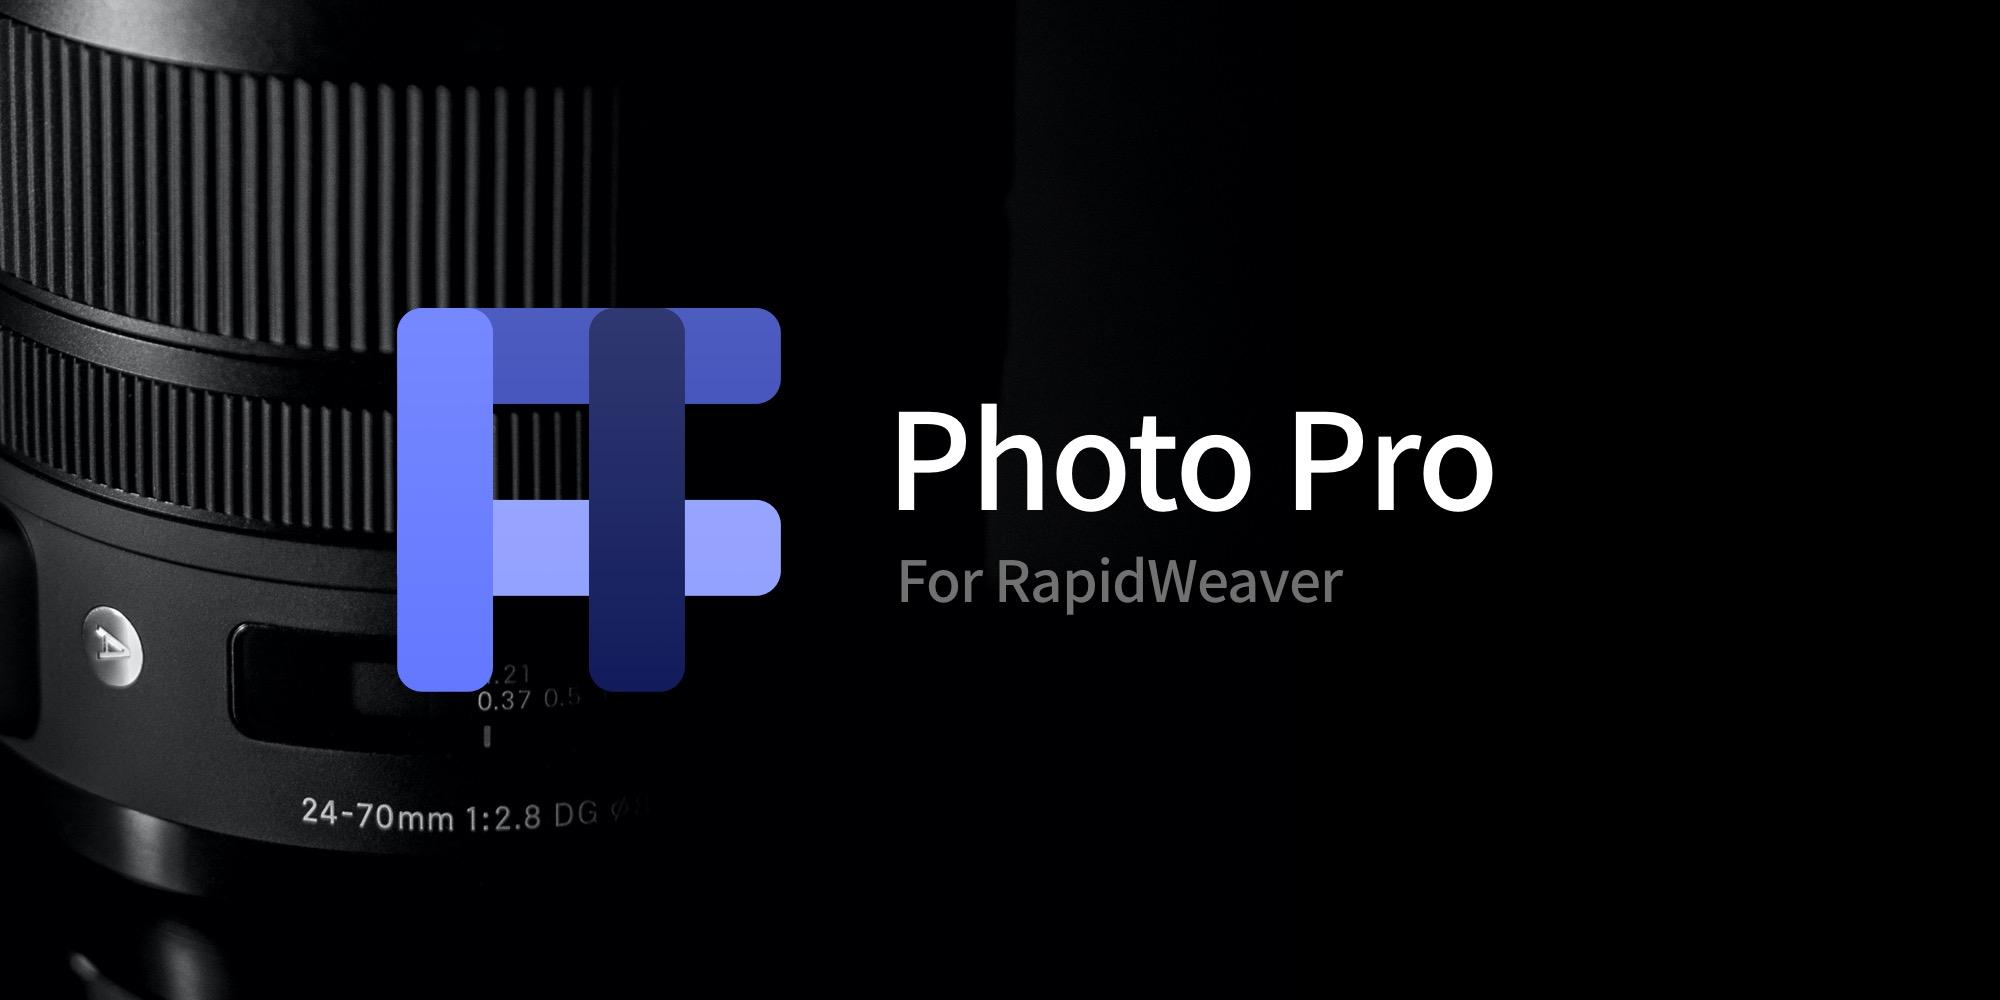 Photo Pro for RapidWeaver